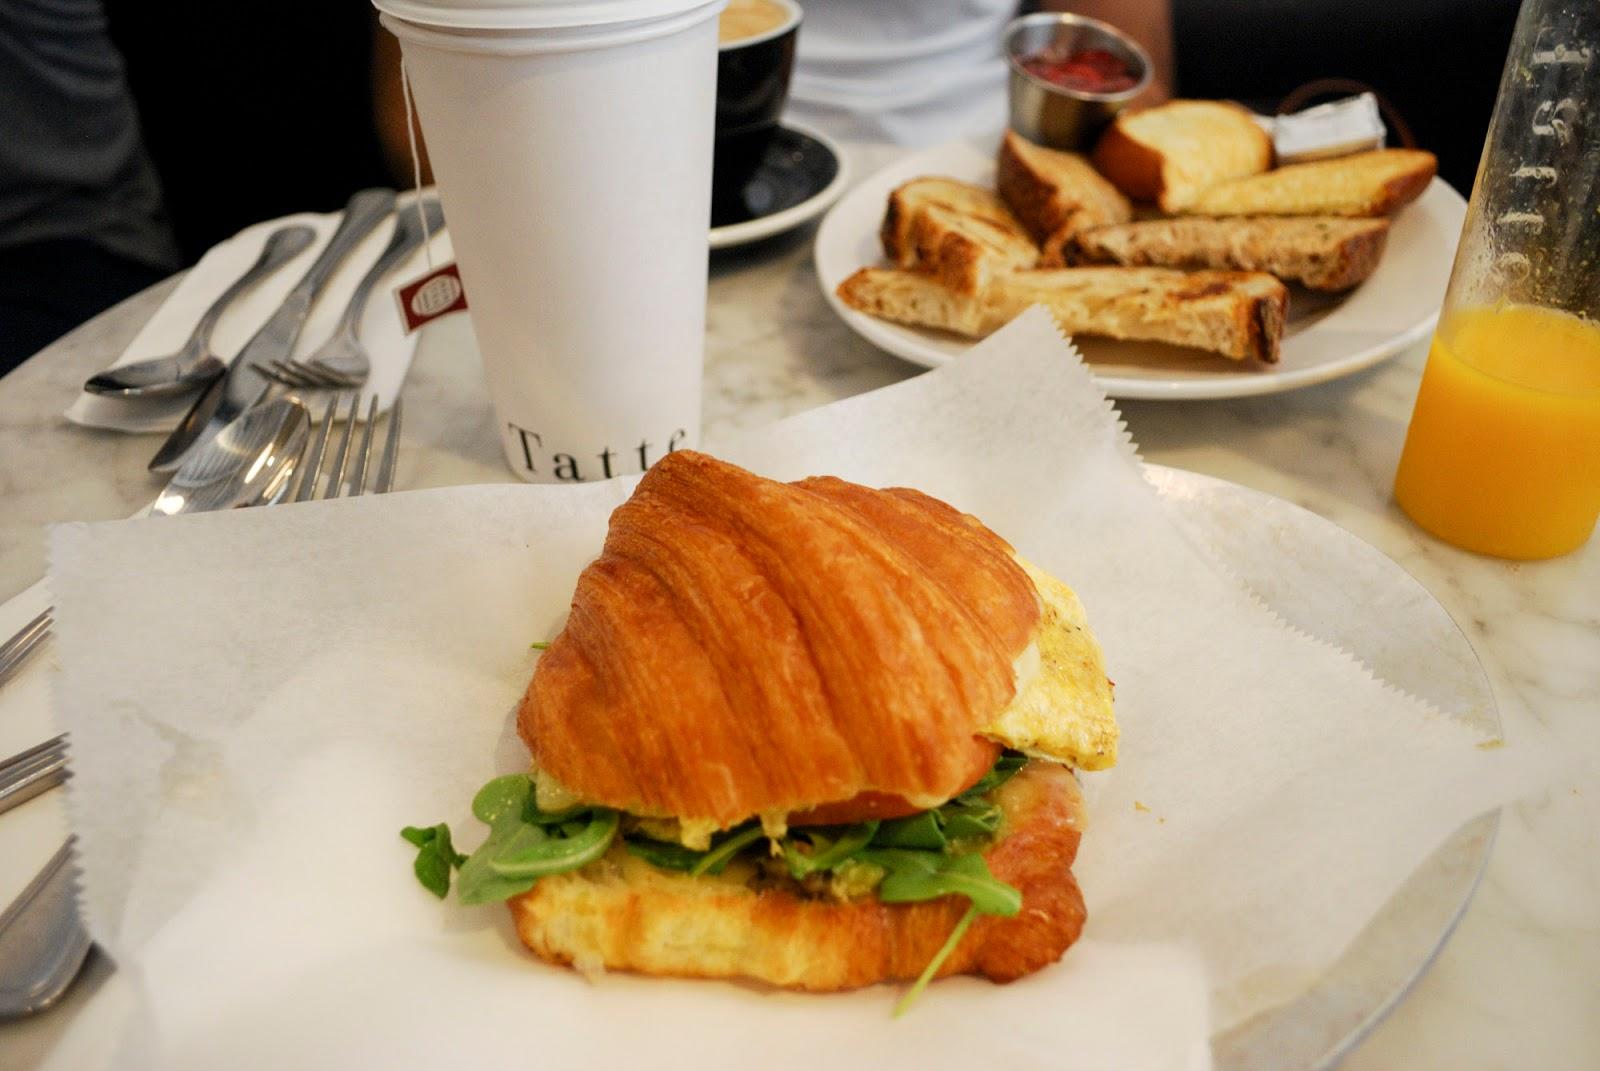 tate bakery cafe restaurant boston usa breakfast brunch